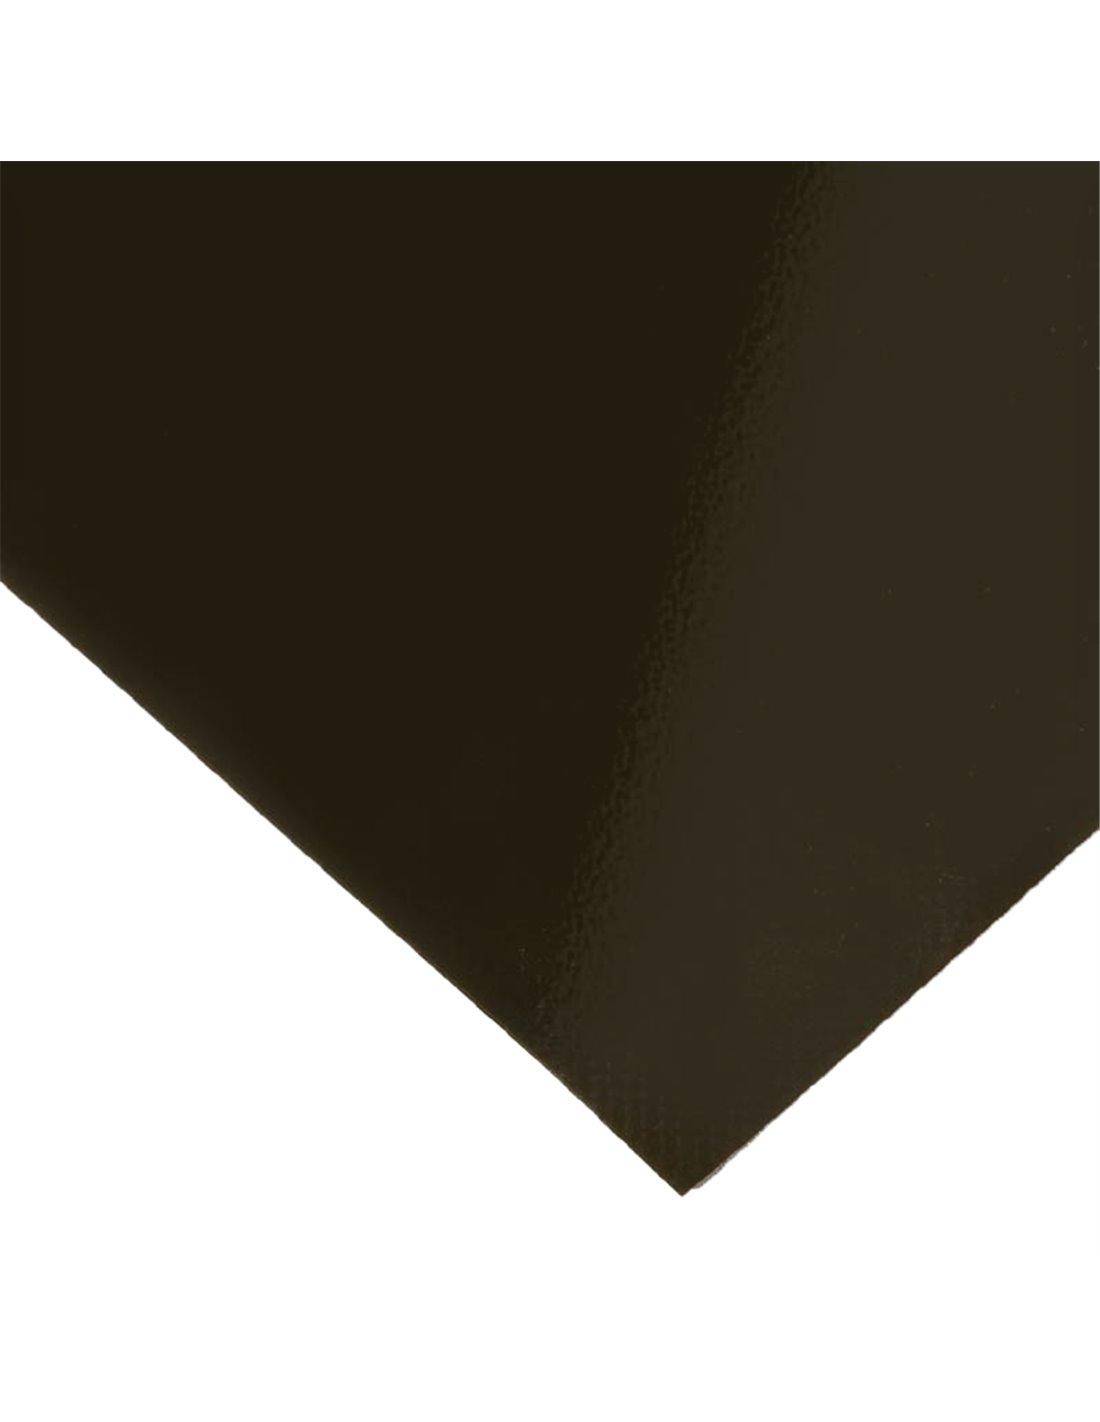 Lona de PVC de 2,5m ancho ML